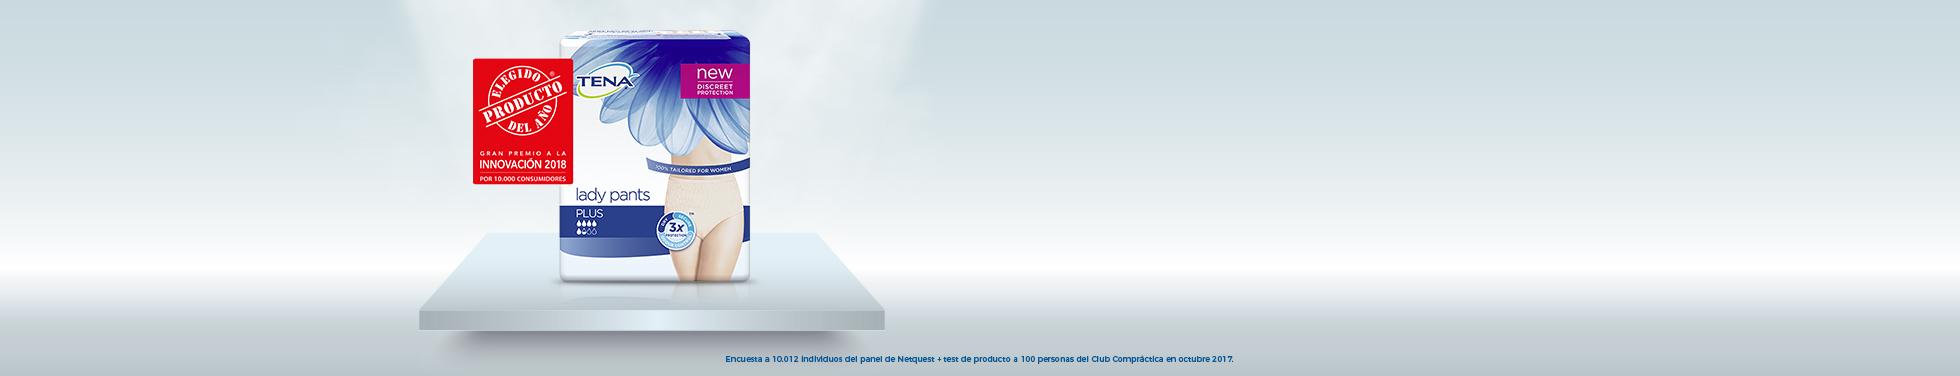 headerTLPPlusPDA-legales.jpg